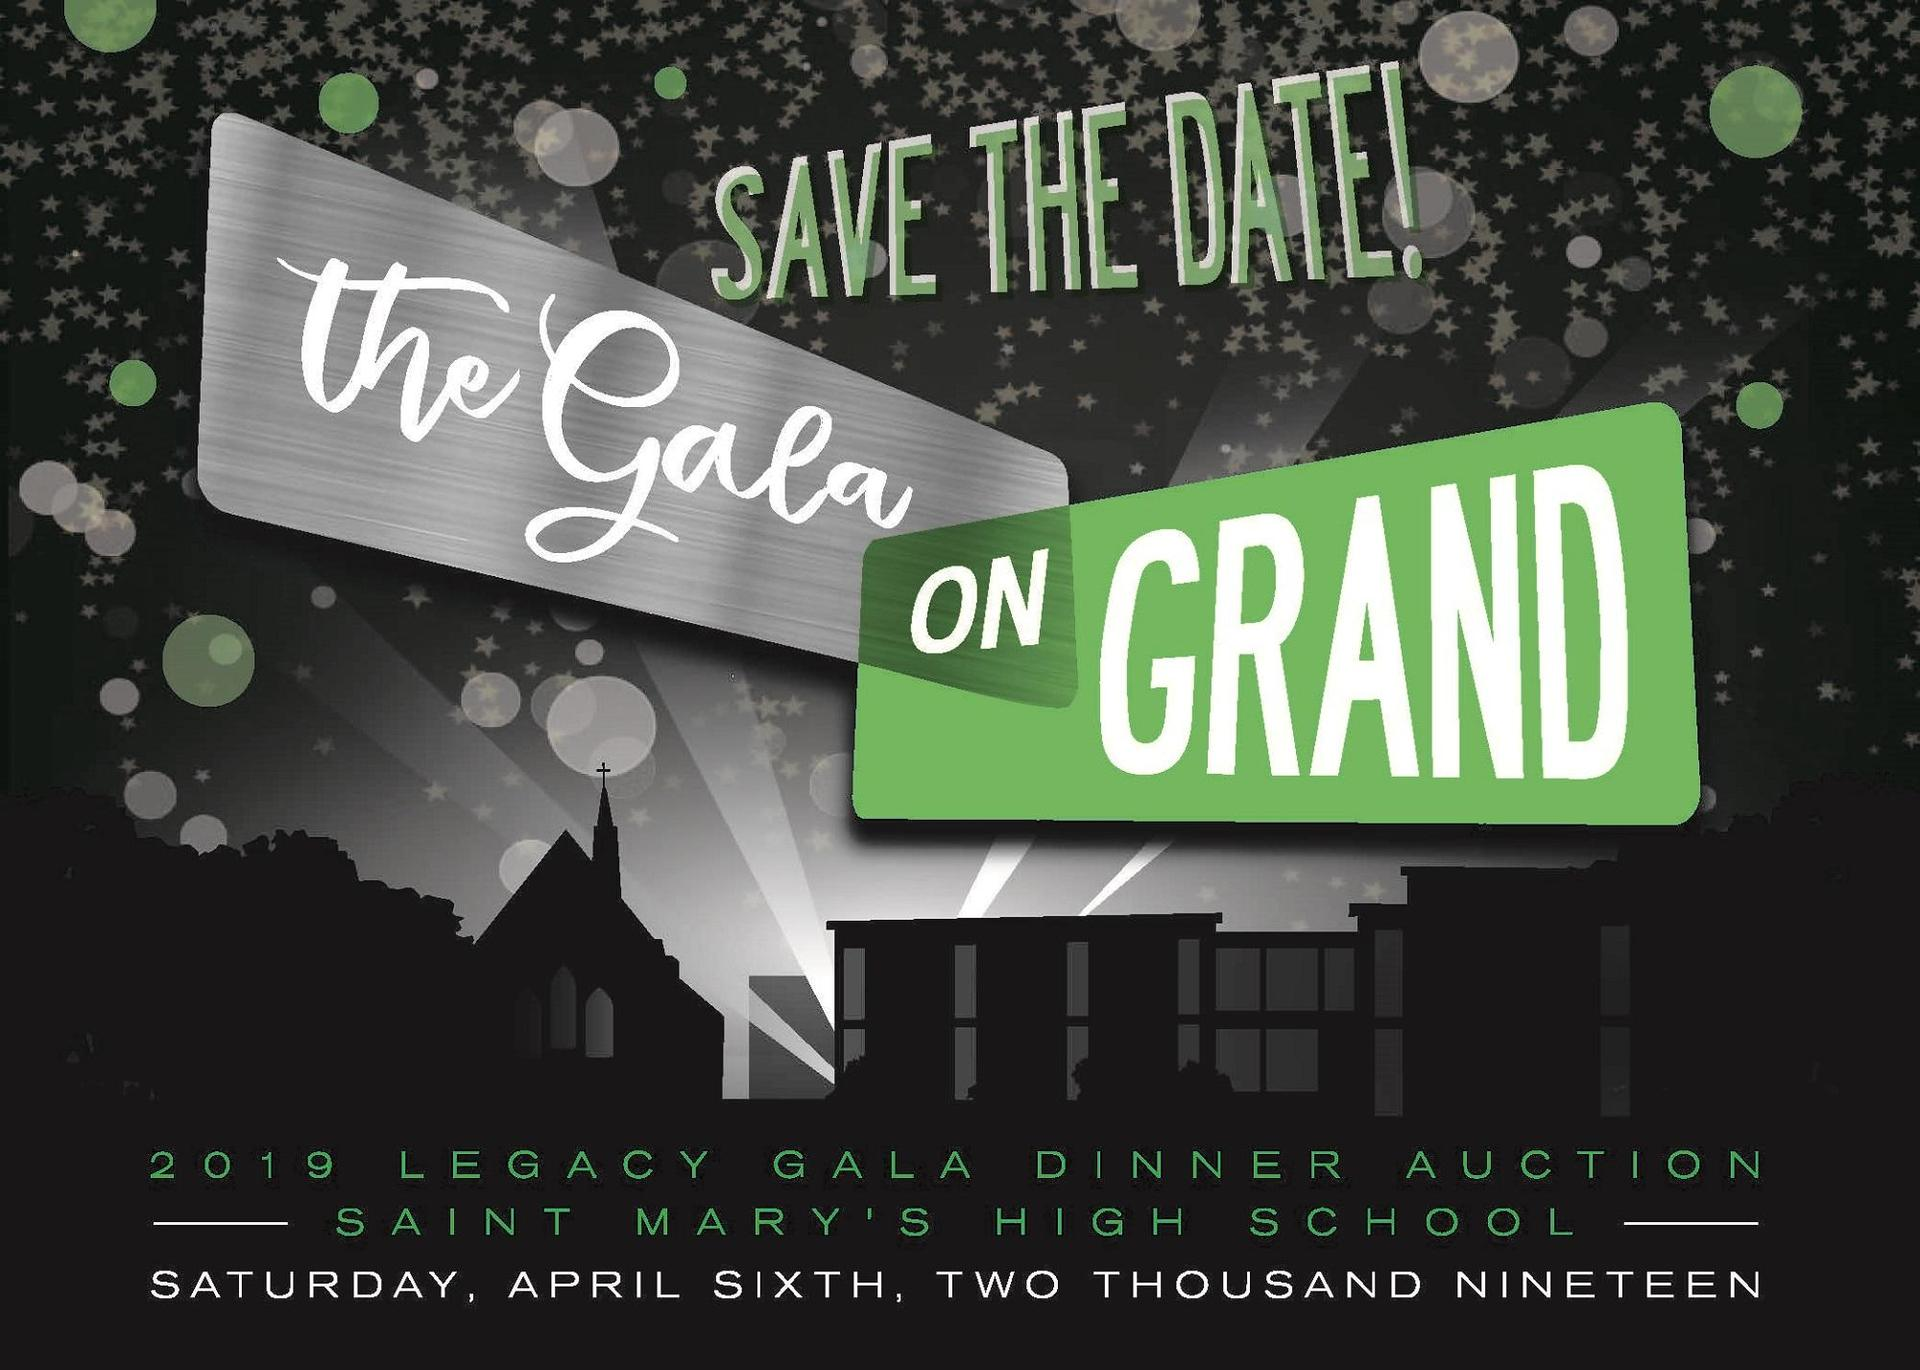 Legacy Gala Dinner Auction